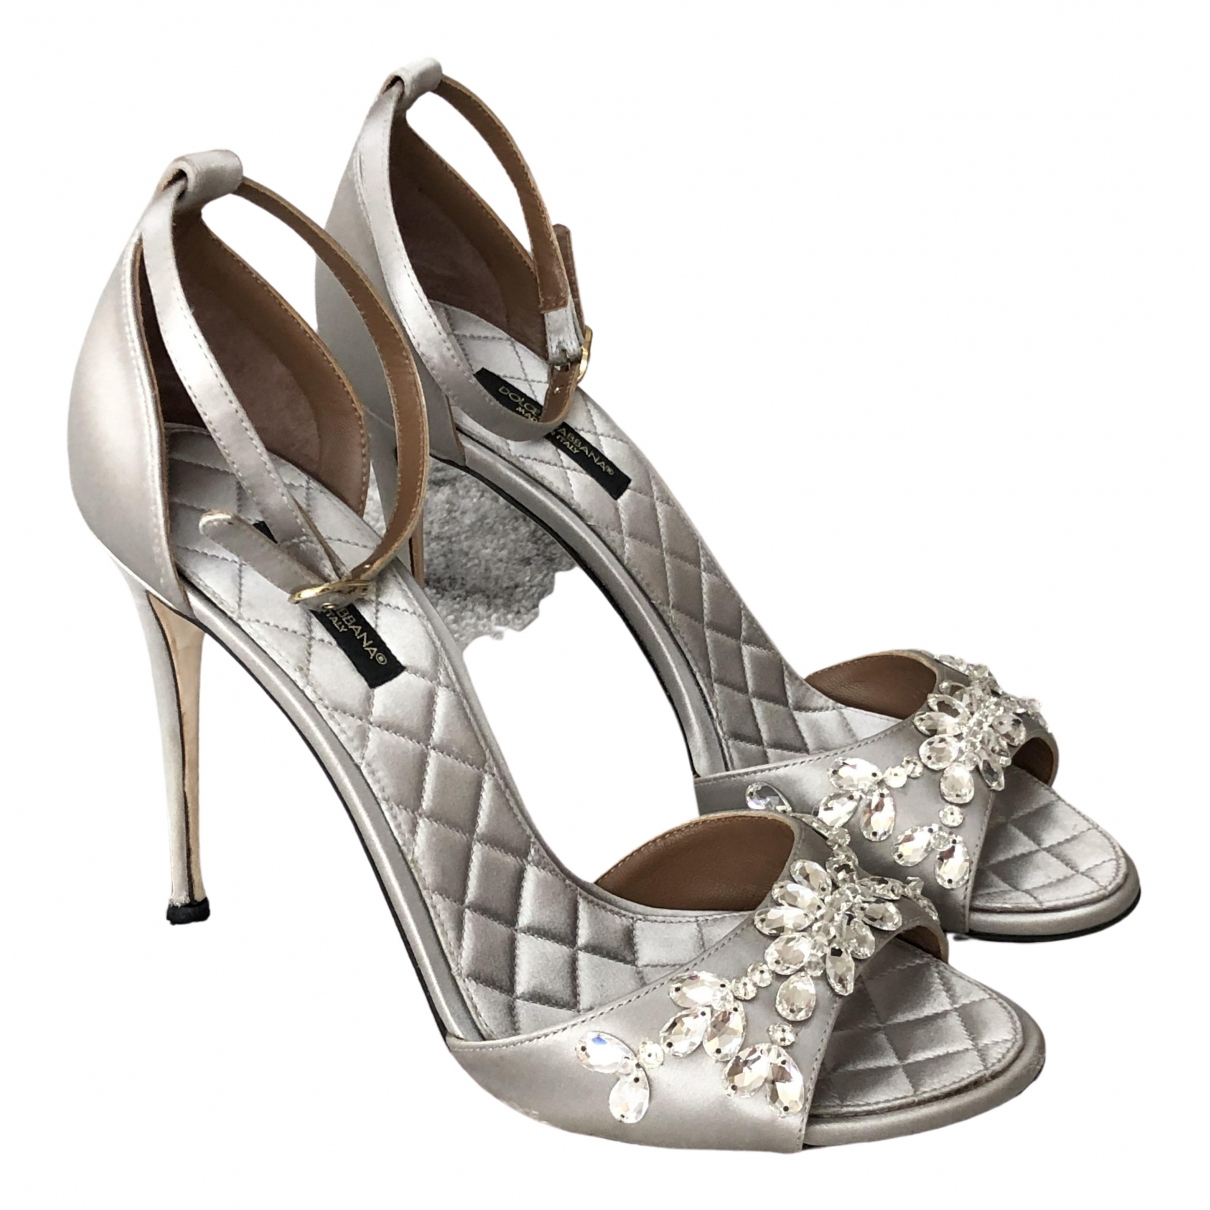 Dolce & Gabbana \N Silver Cloth Sandals for Women 38 EU